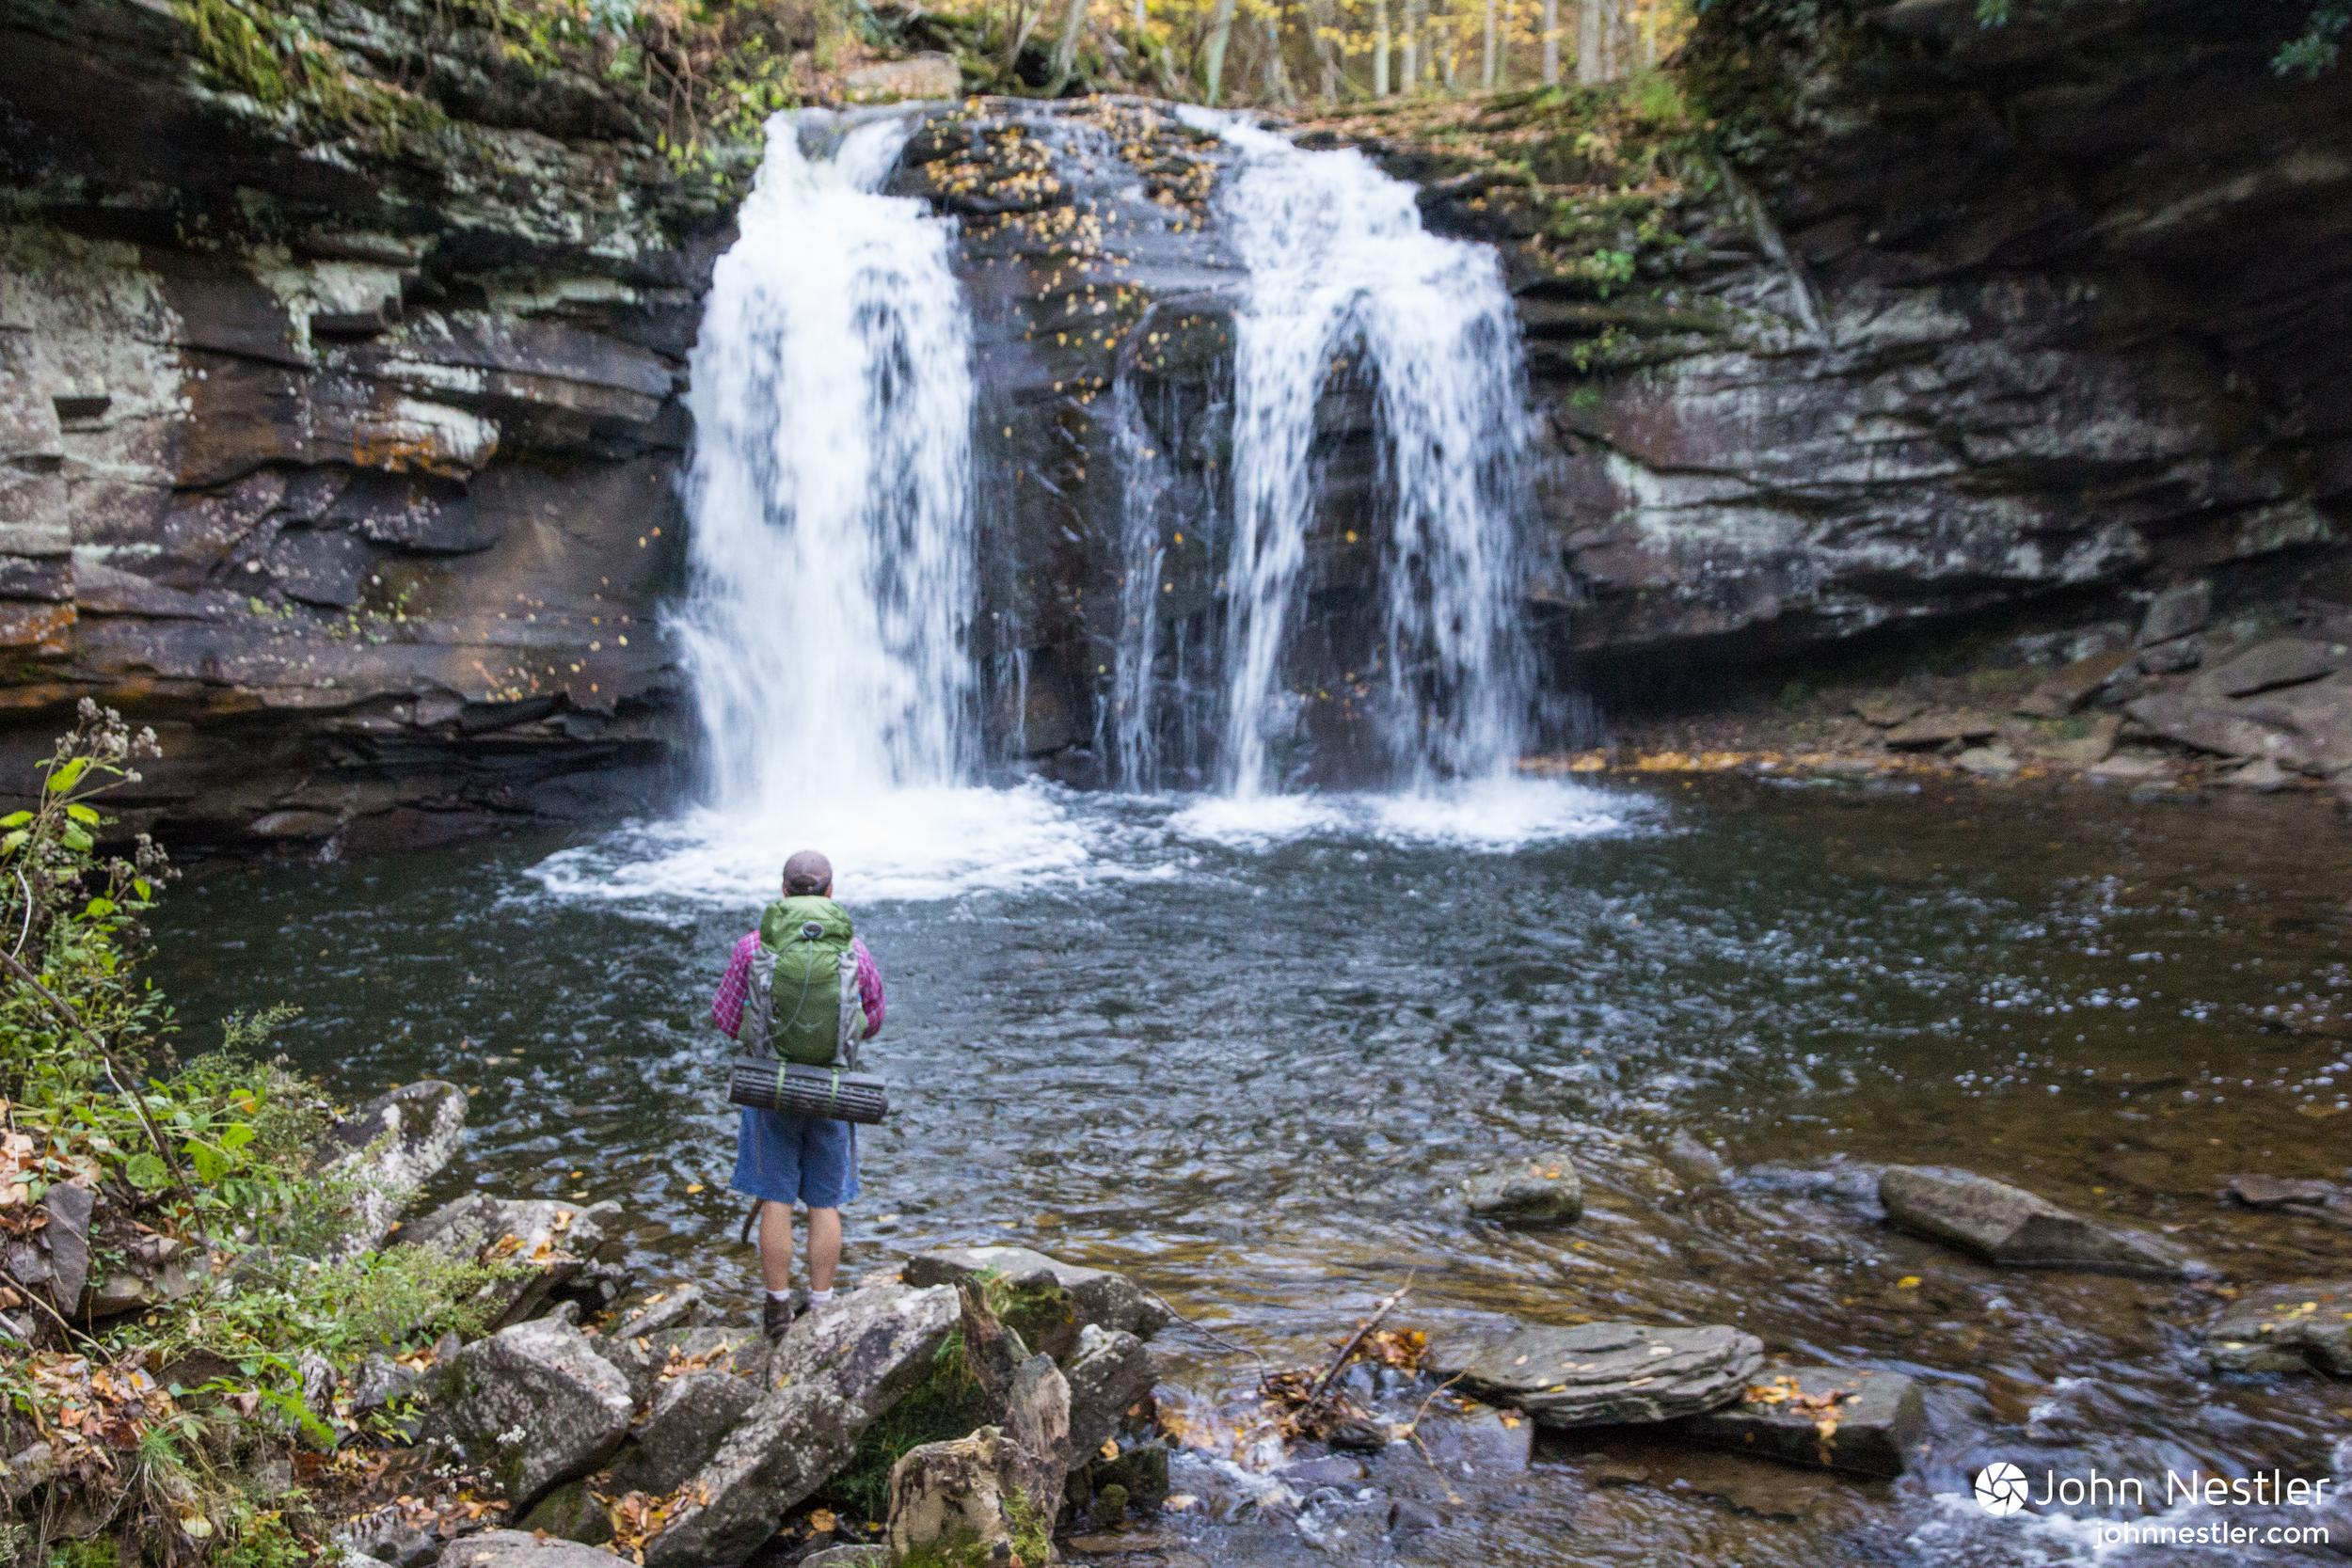 Getting a glimpse of Upper Seneca Creek Falls and a cool, wet spray.